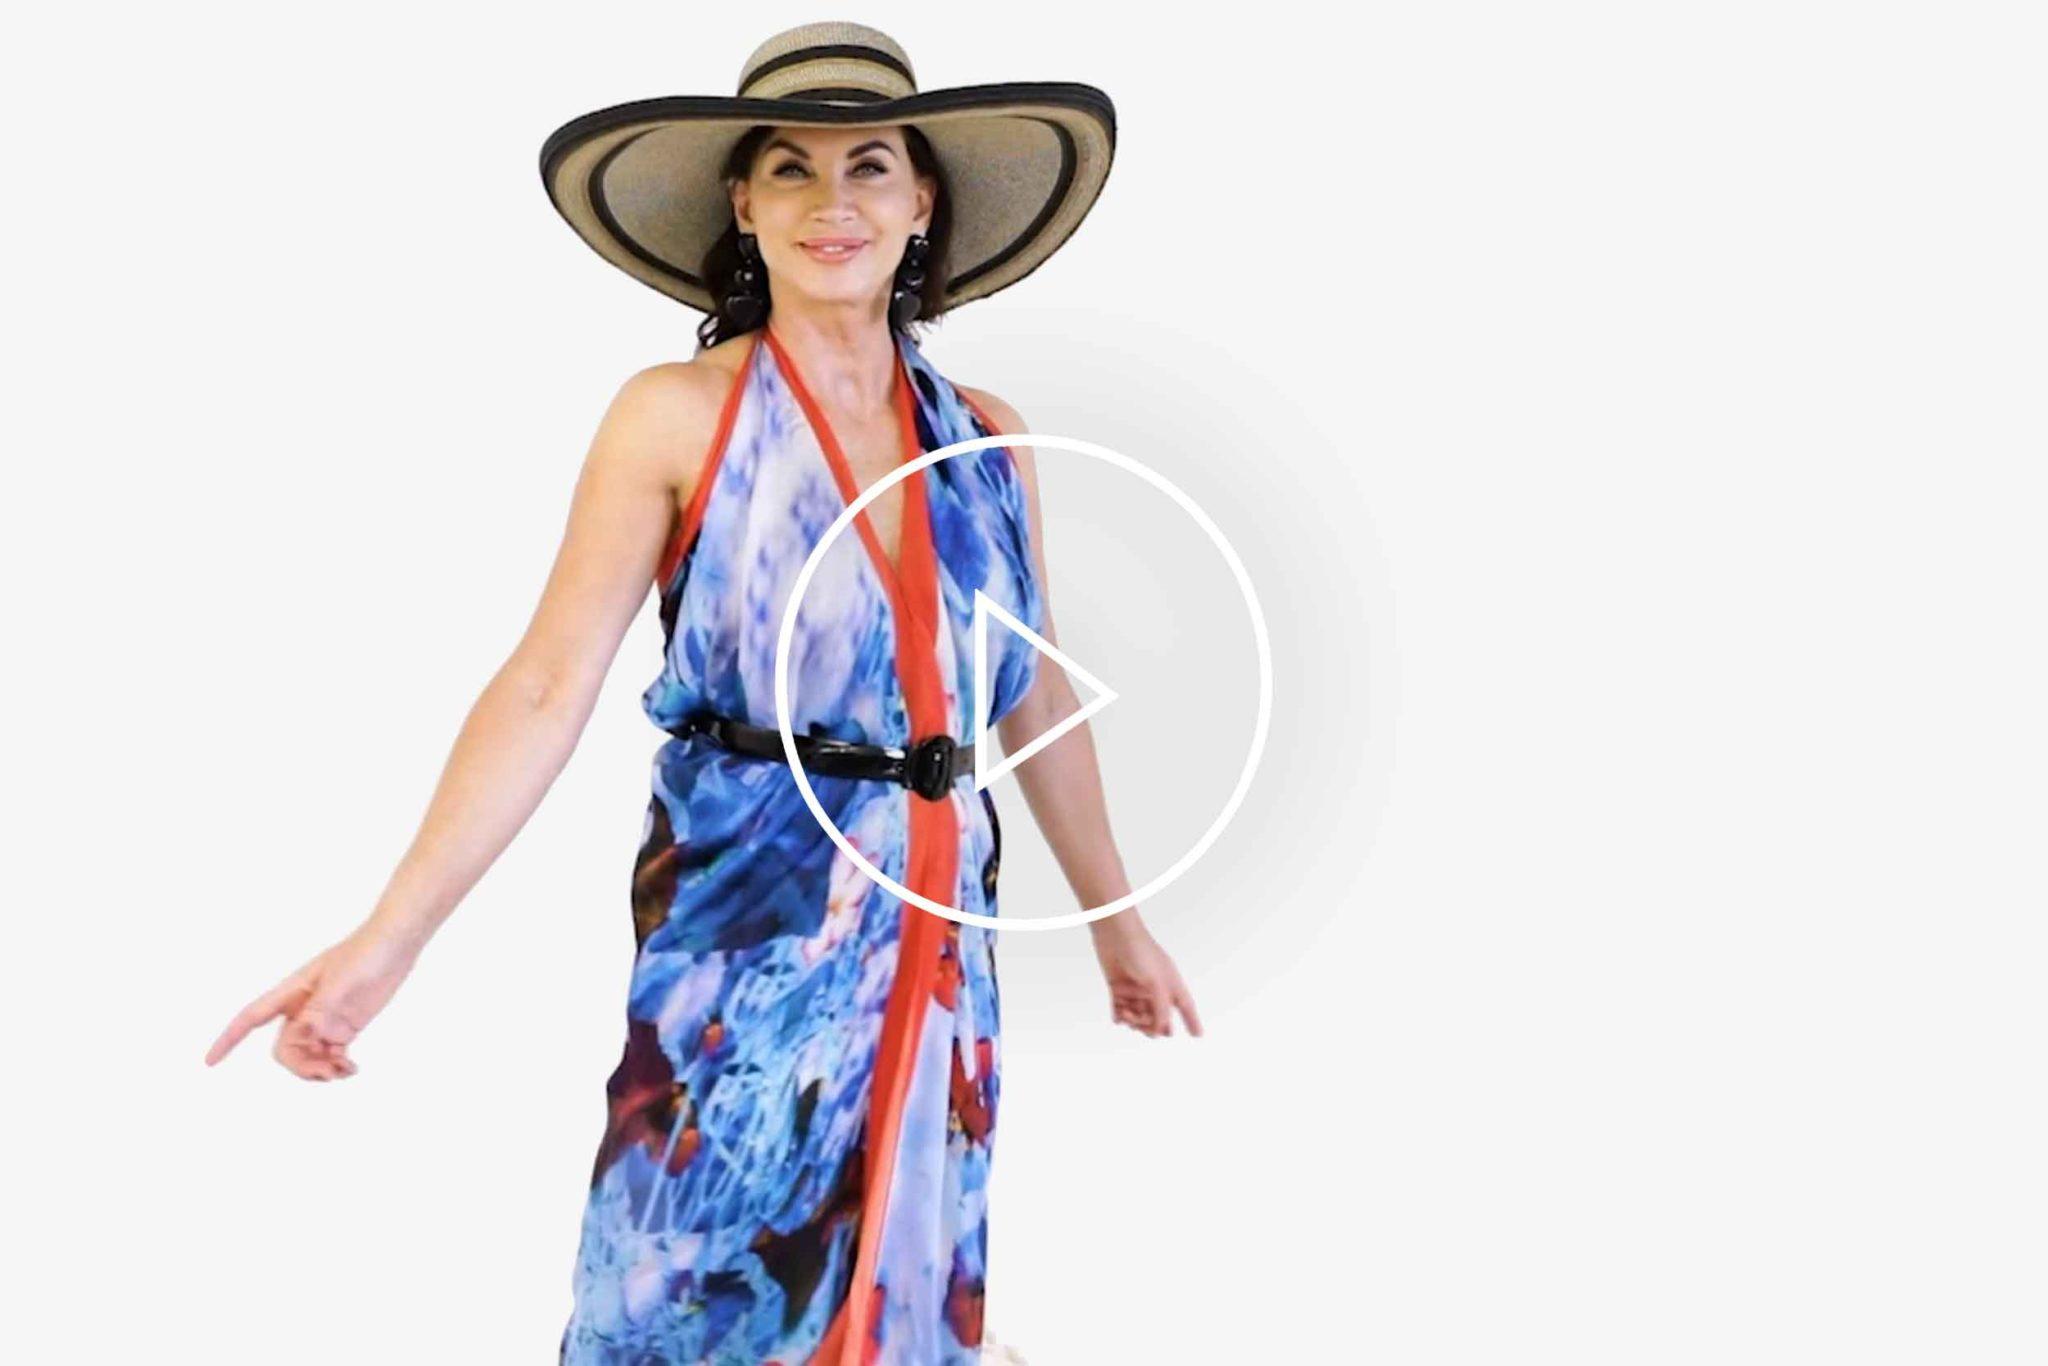 Cornelia Hagmann La Galleria Silk Scarves Styles Inspirations No 1 2 3, Seidenschal, sciarpa di seta, foulard soie,